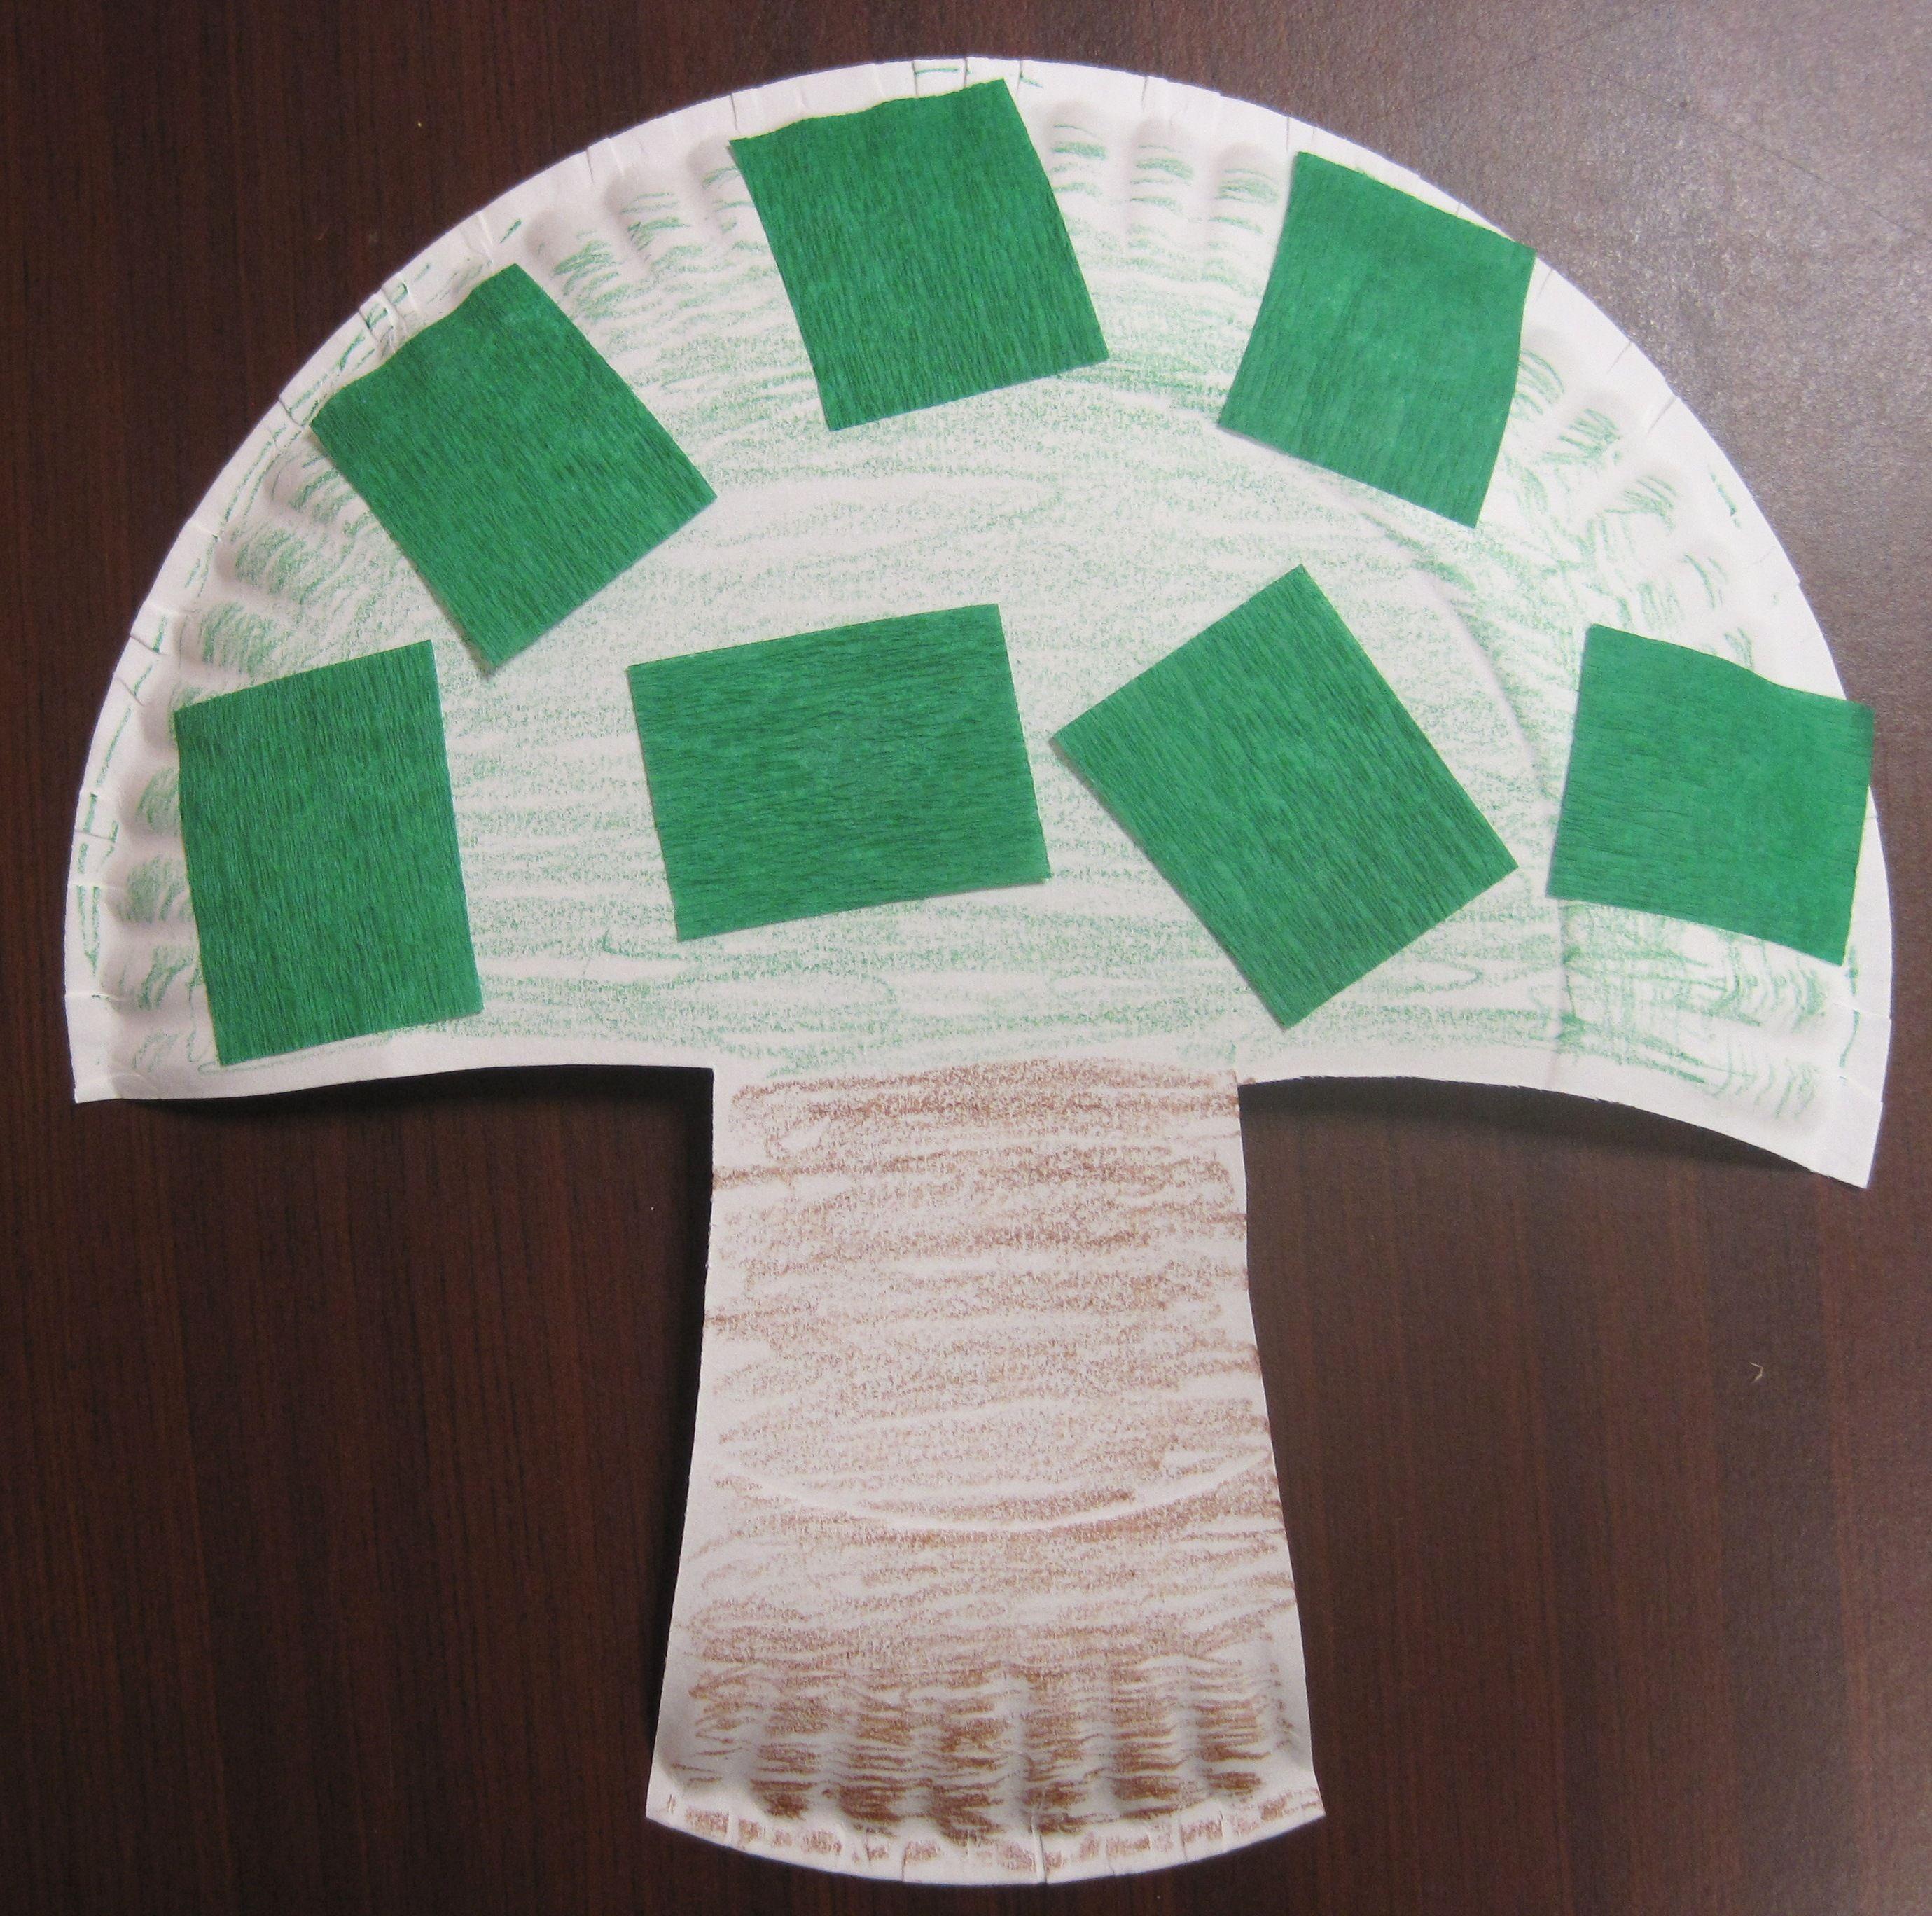 preschool crafts for zacchaeus | Craft Pic_03 Mar Week 3 | Christian ...